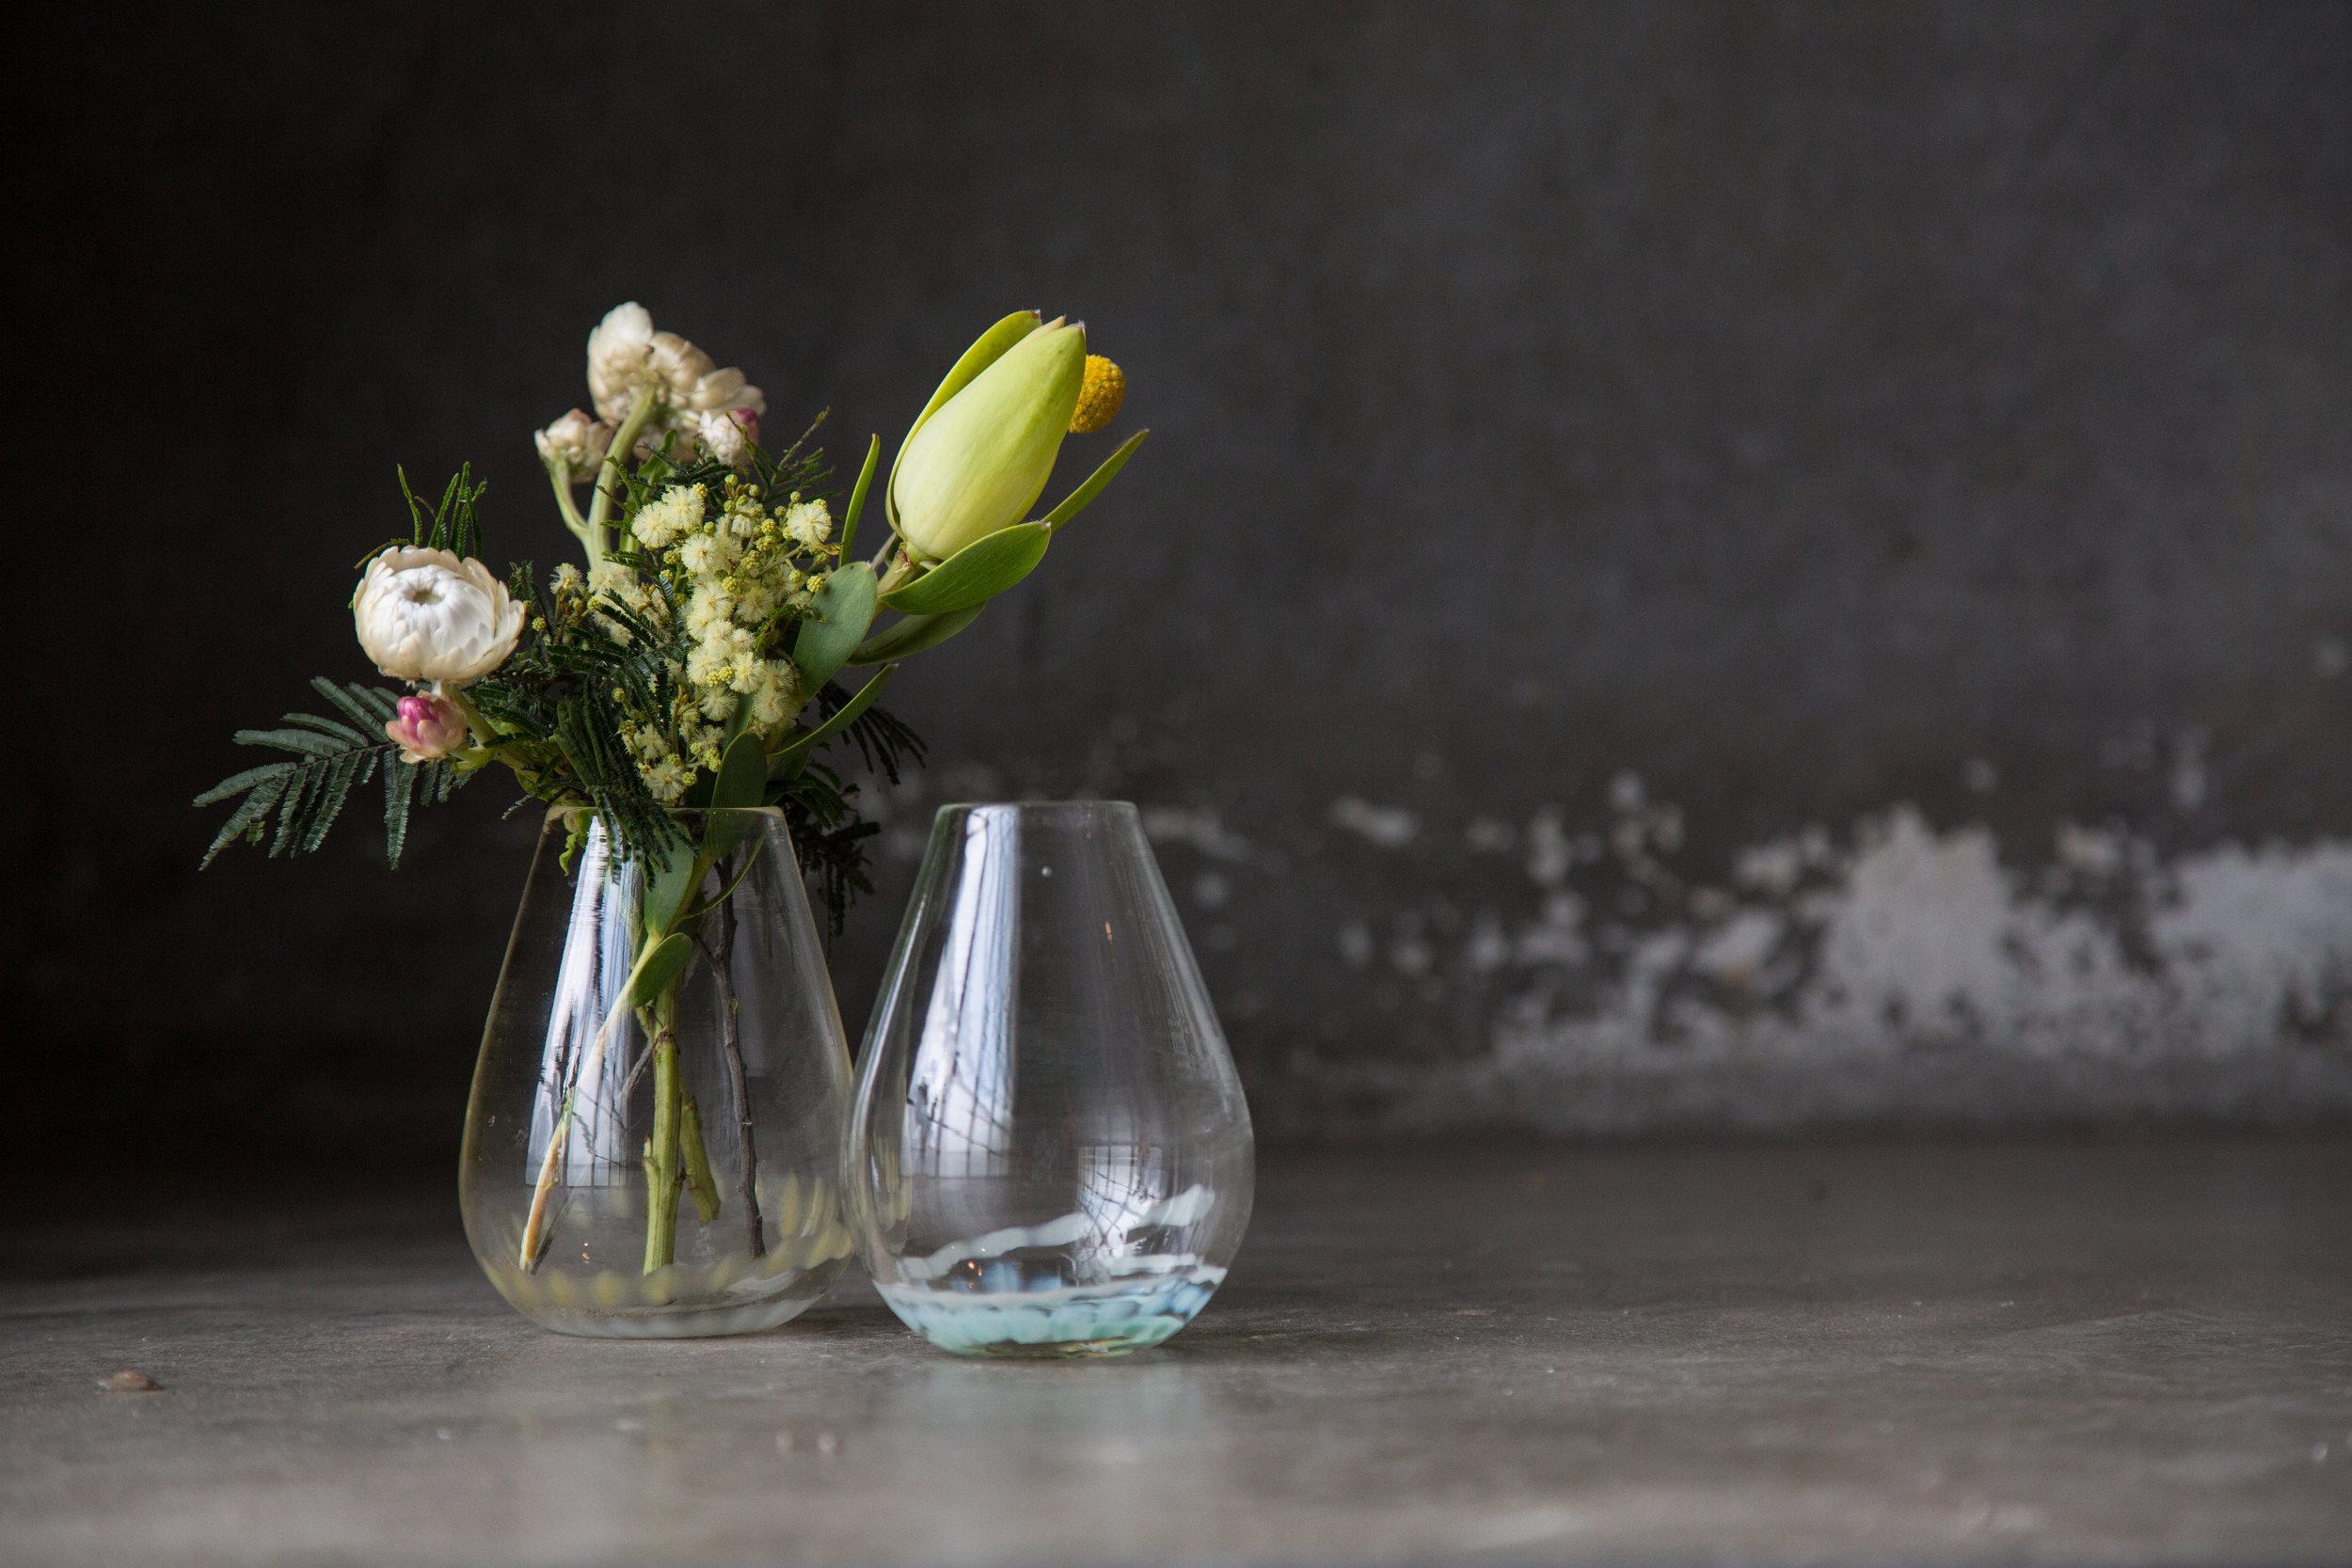 vases-10.jpg